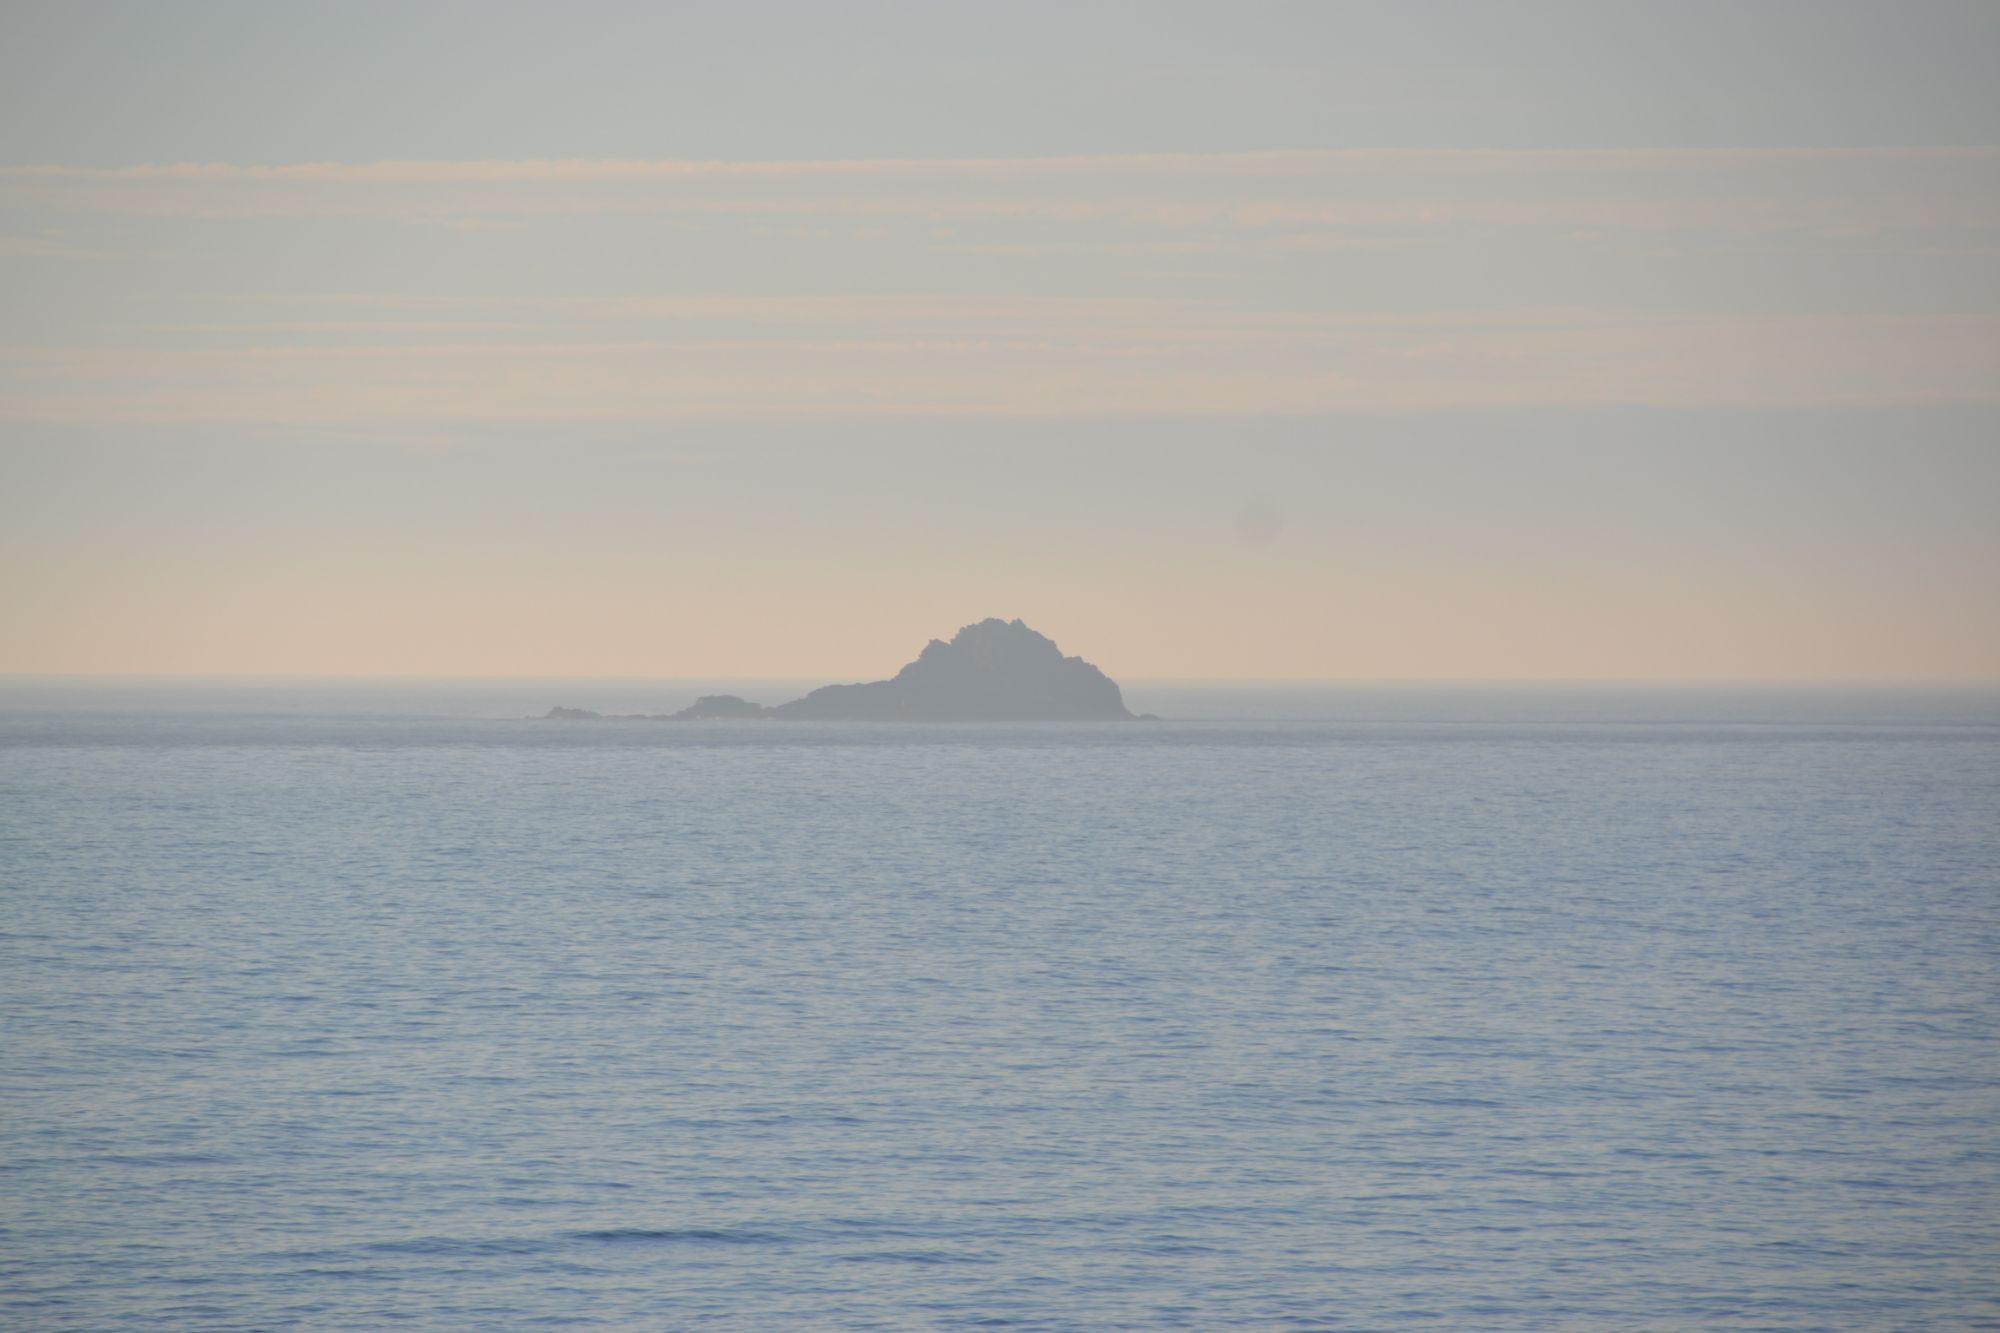 sennen cove and lands end longships lighhouse